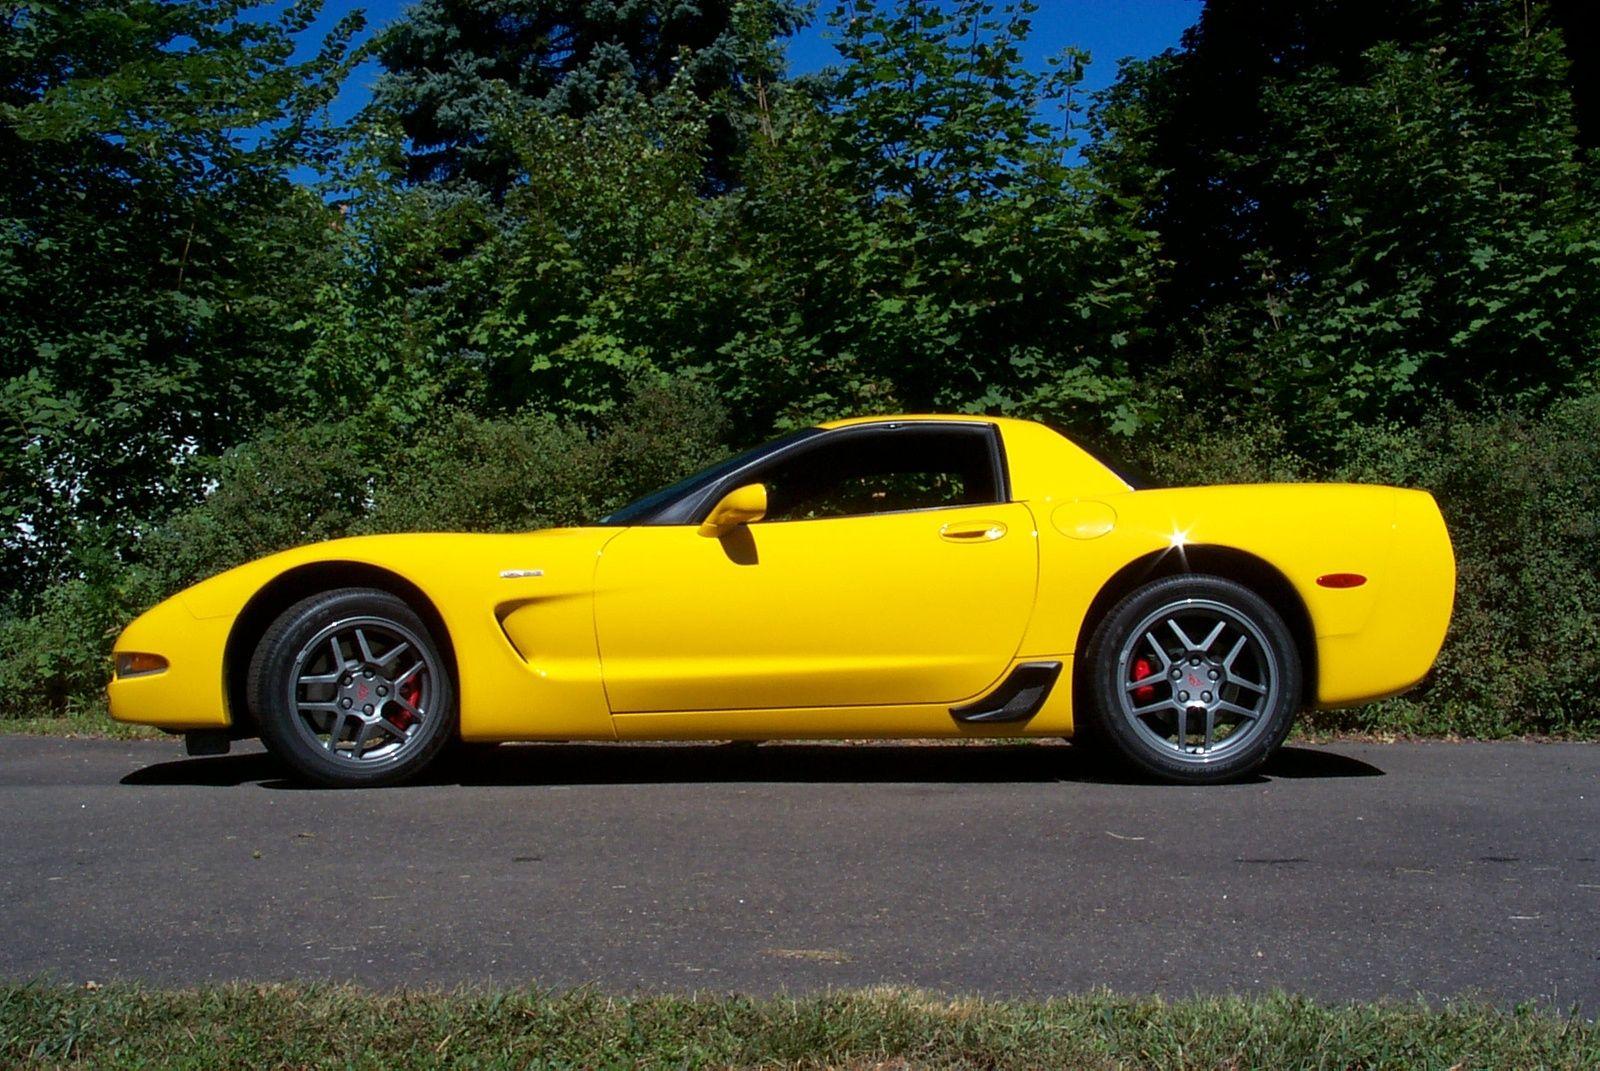 2002 Chevrolet Corvette Z06 Chevrolet Corvette Z06 Chevrolet